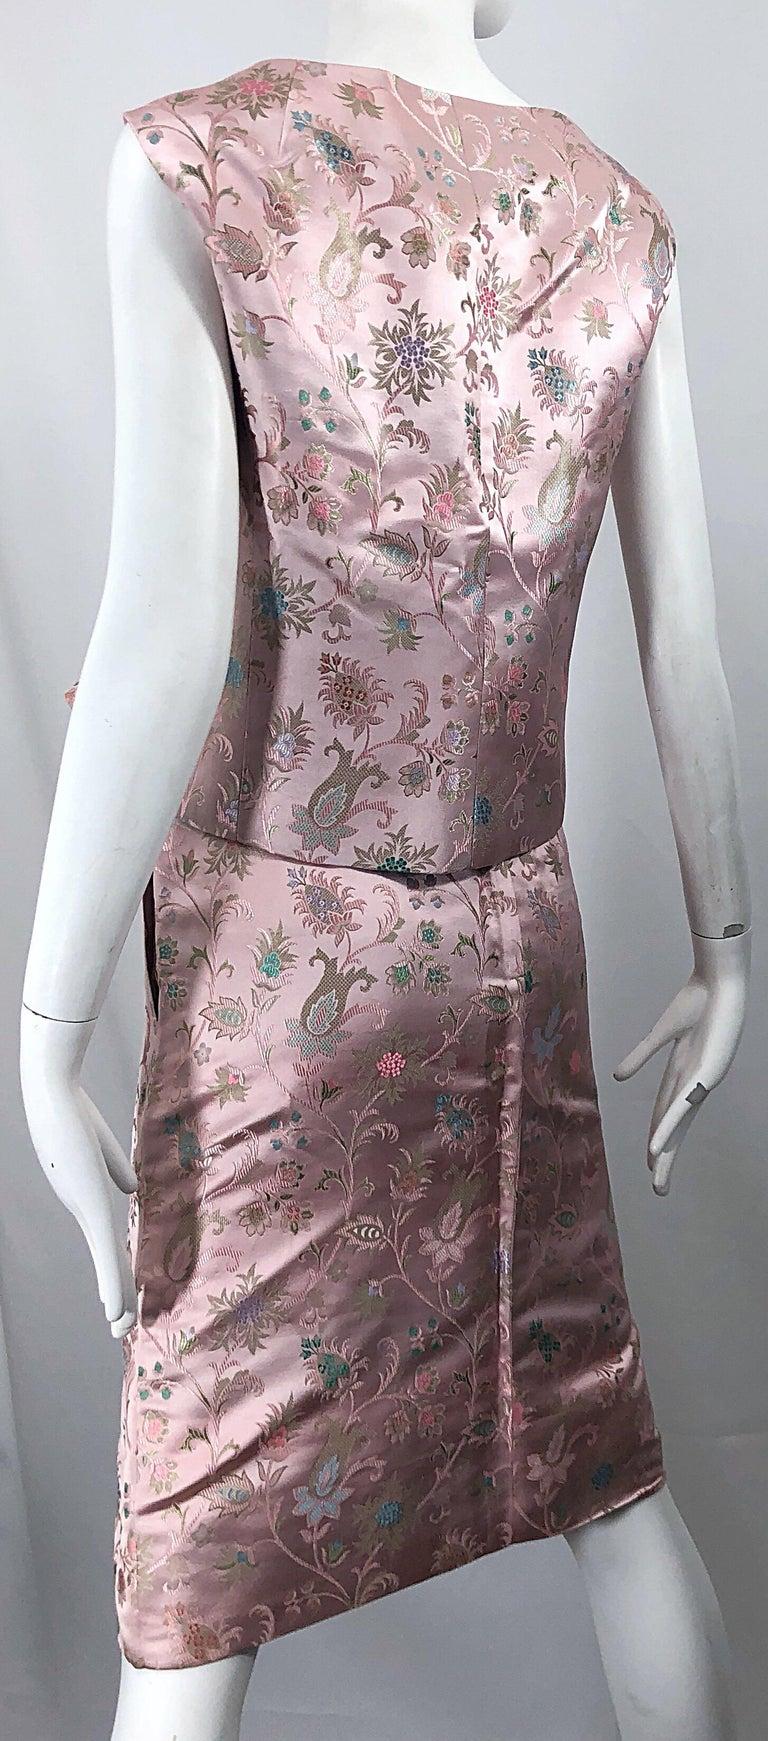 Dynasty 1960s For Lord & Taylor Light Pink Large Size 3 Piece Vintage Dress Set For Sale 2